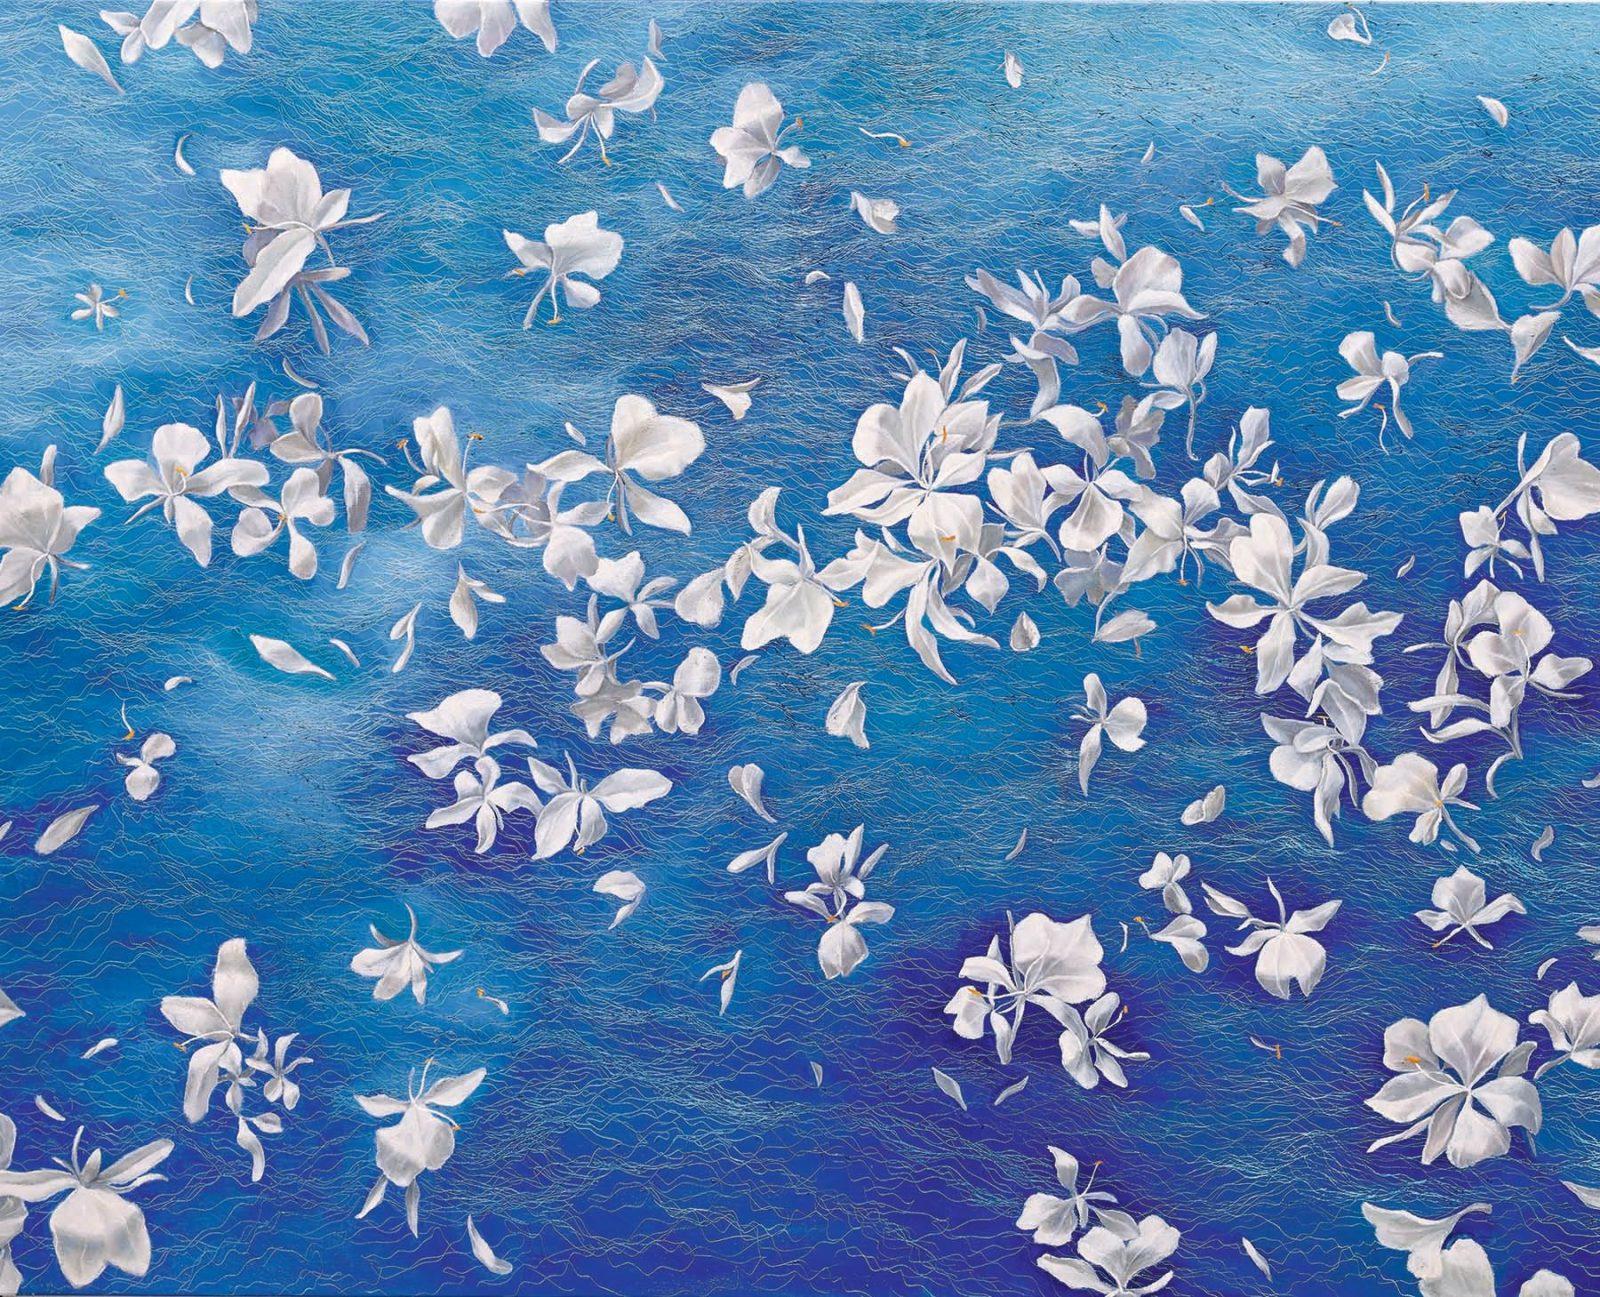 野薑花 白色華麗, White Elegance,130 x 162 cm, oil on canvas, 2015